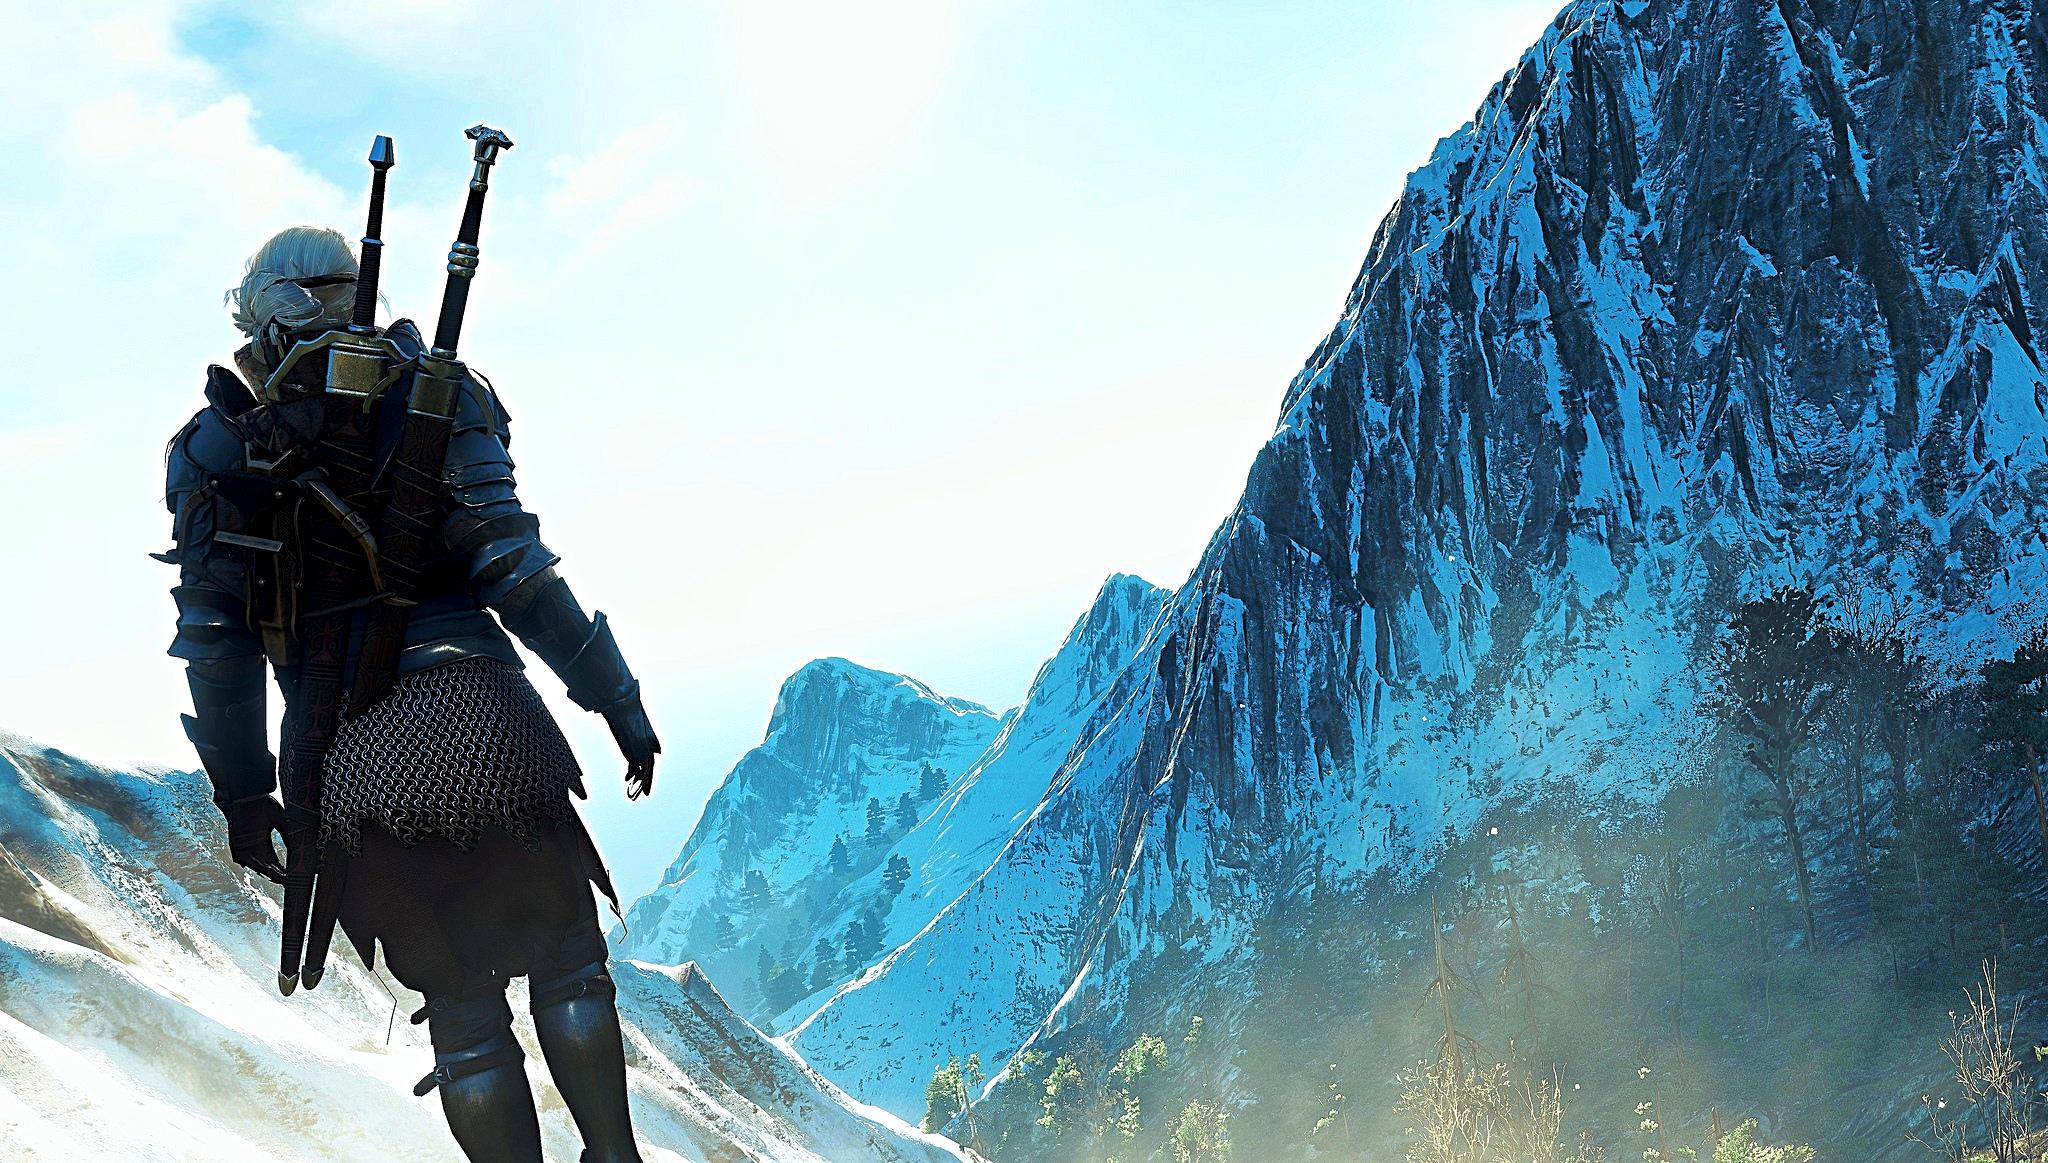 123t1hfhtf133-j (1).jpg - Witcher 3: Wild Hunt, the